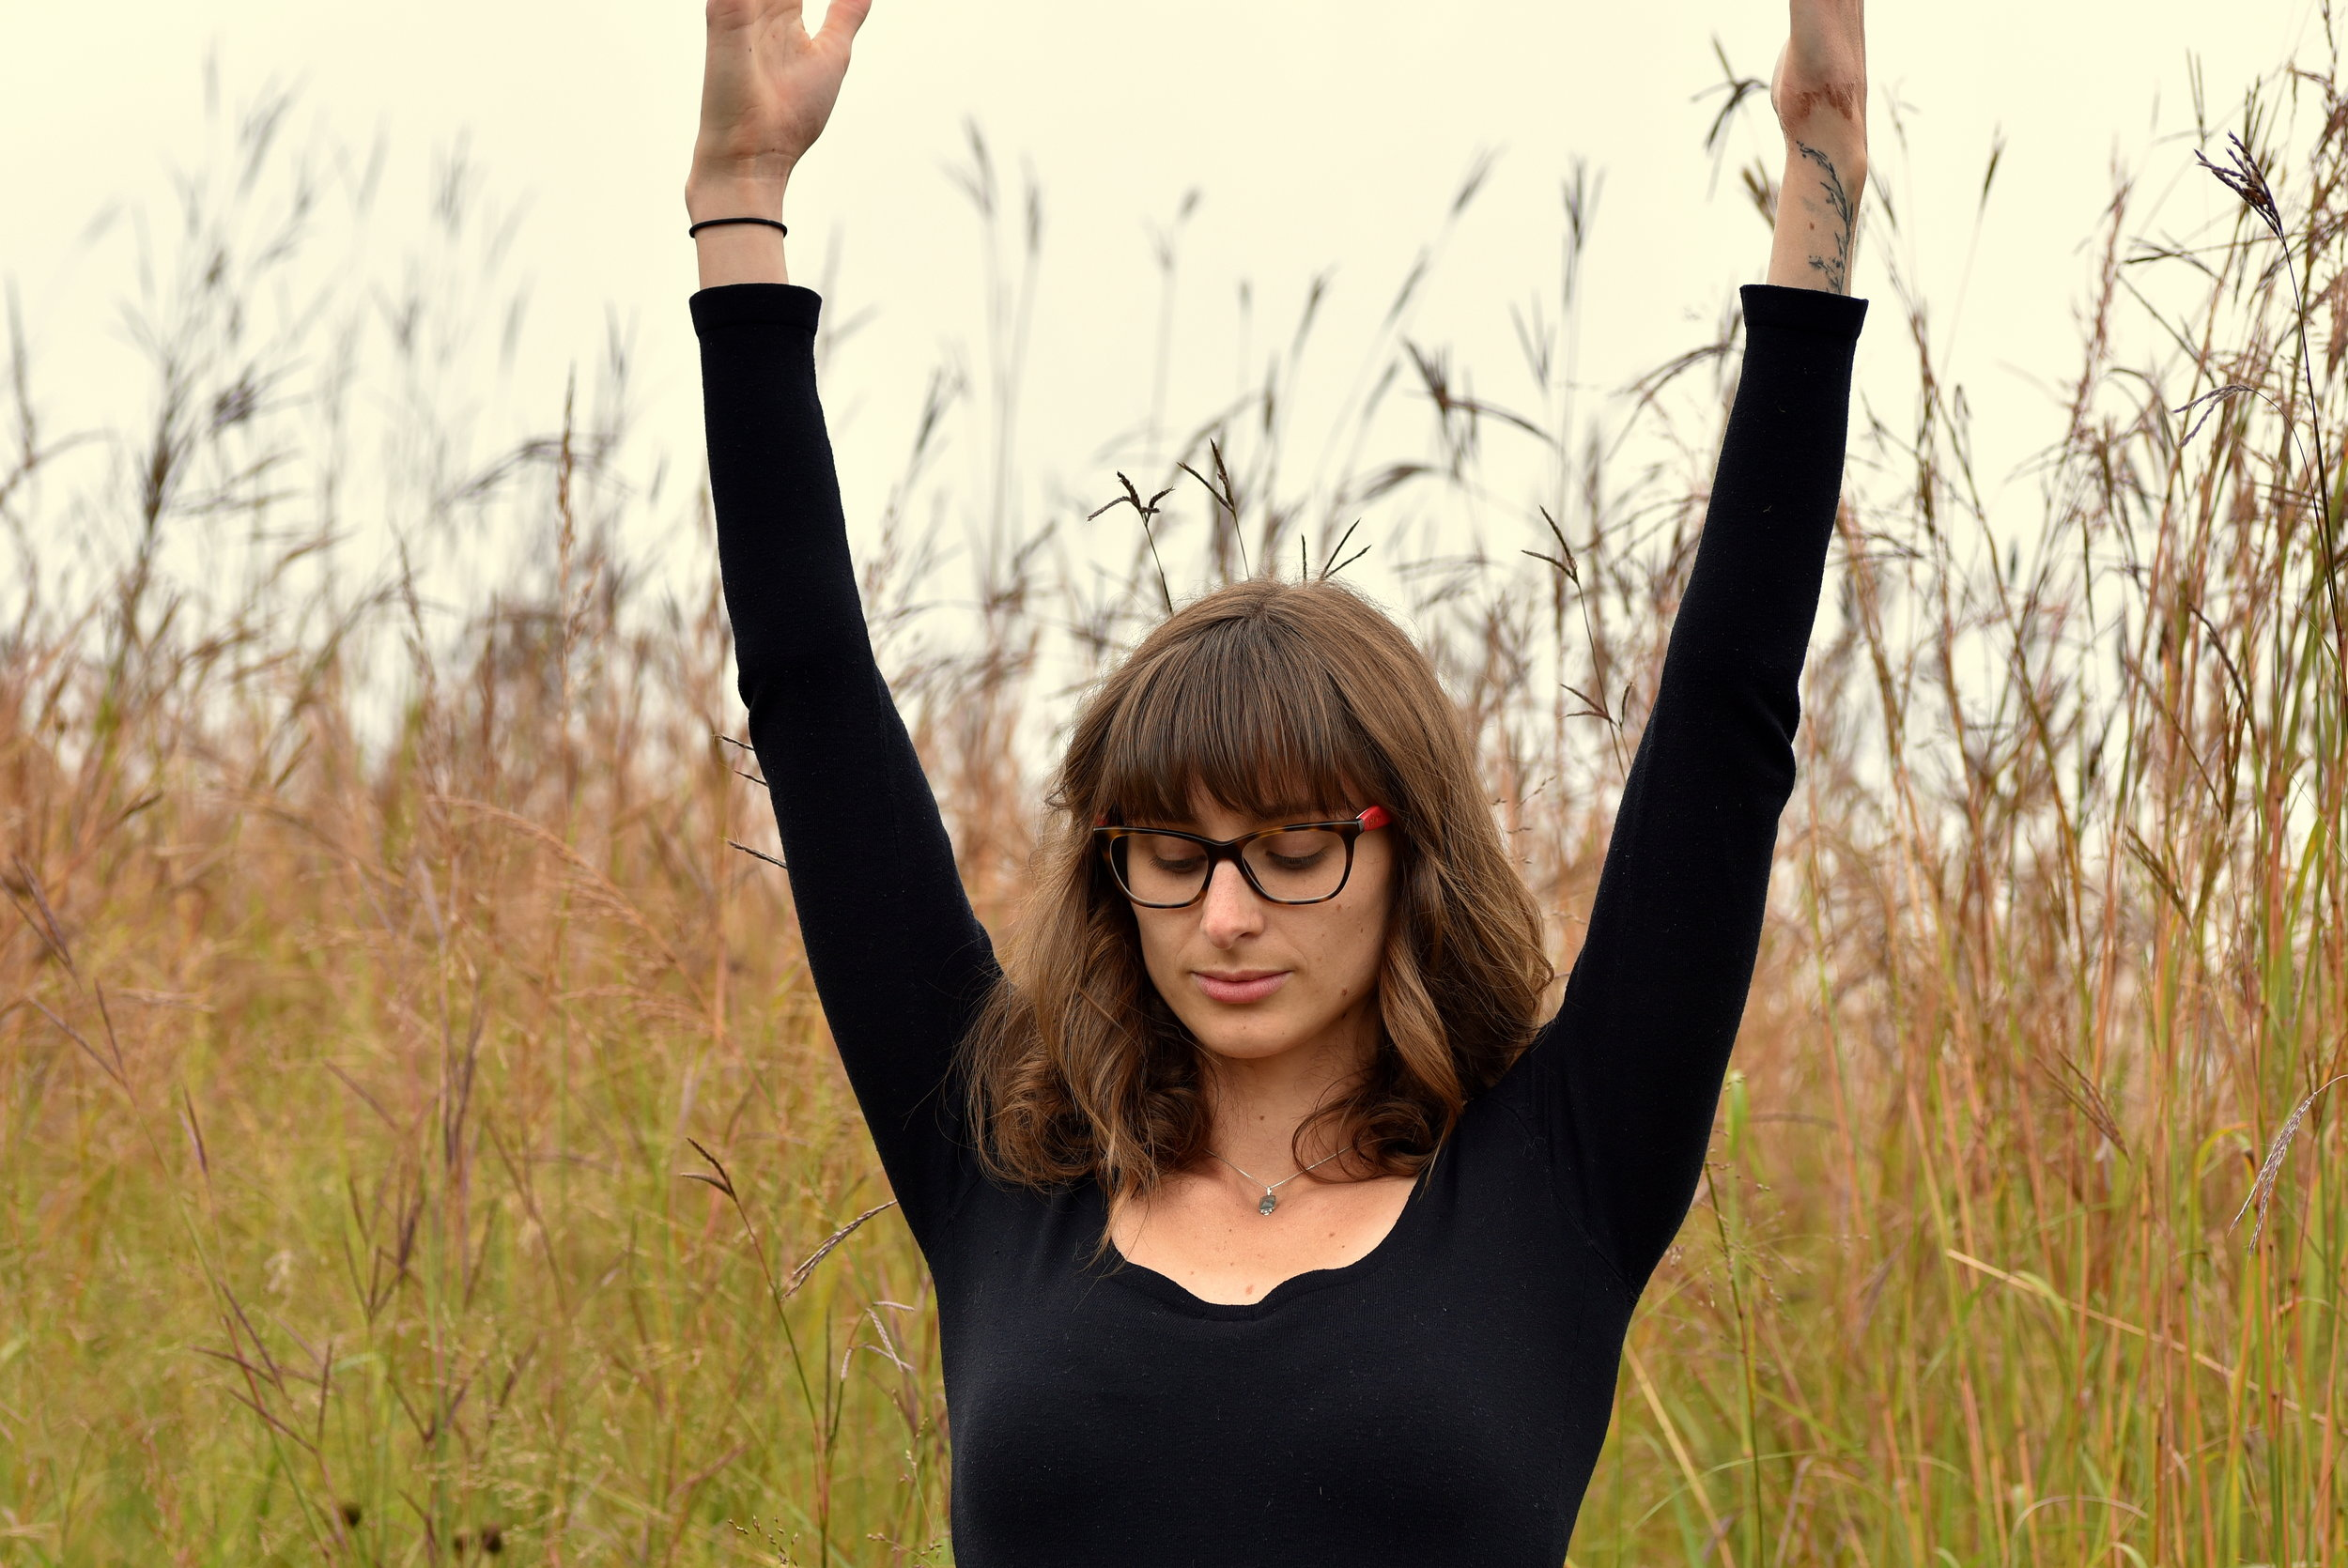 Photo credit to incredible meditation and mindfulness teacher, photographer, and human  Joy Jordan .